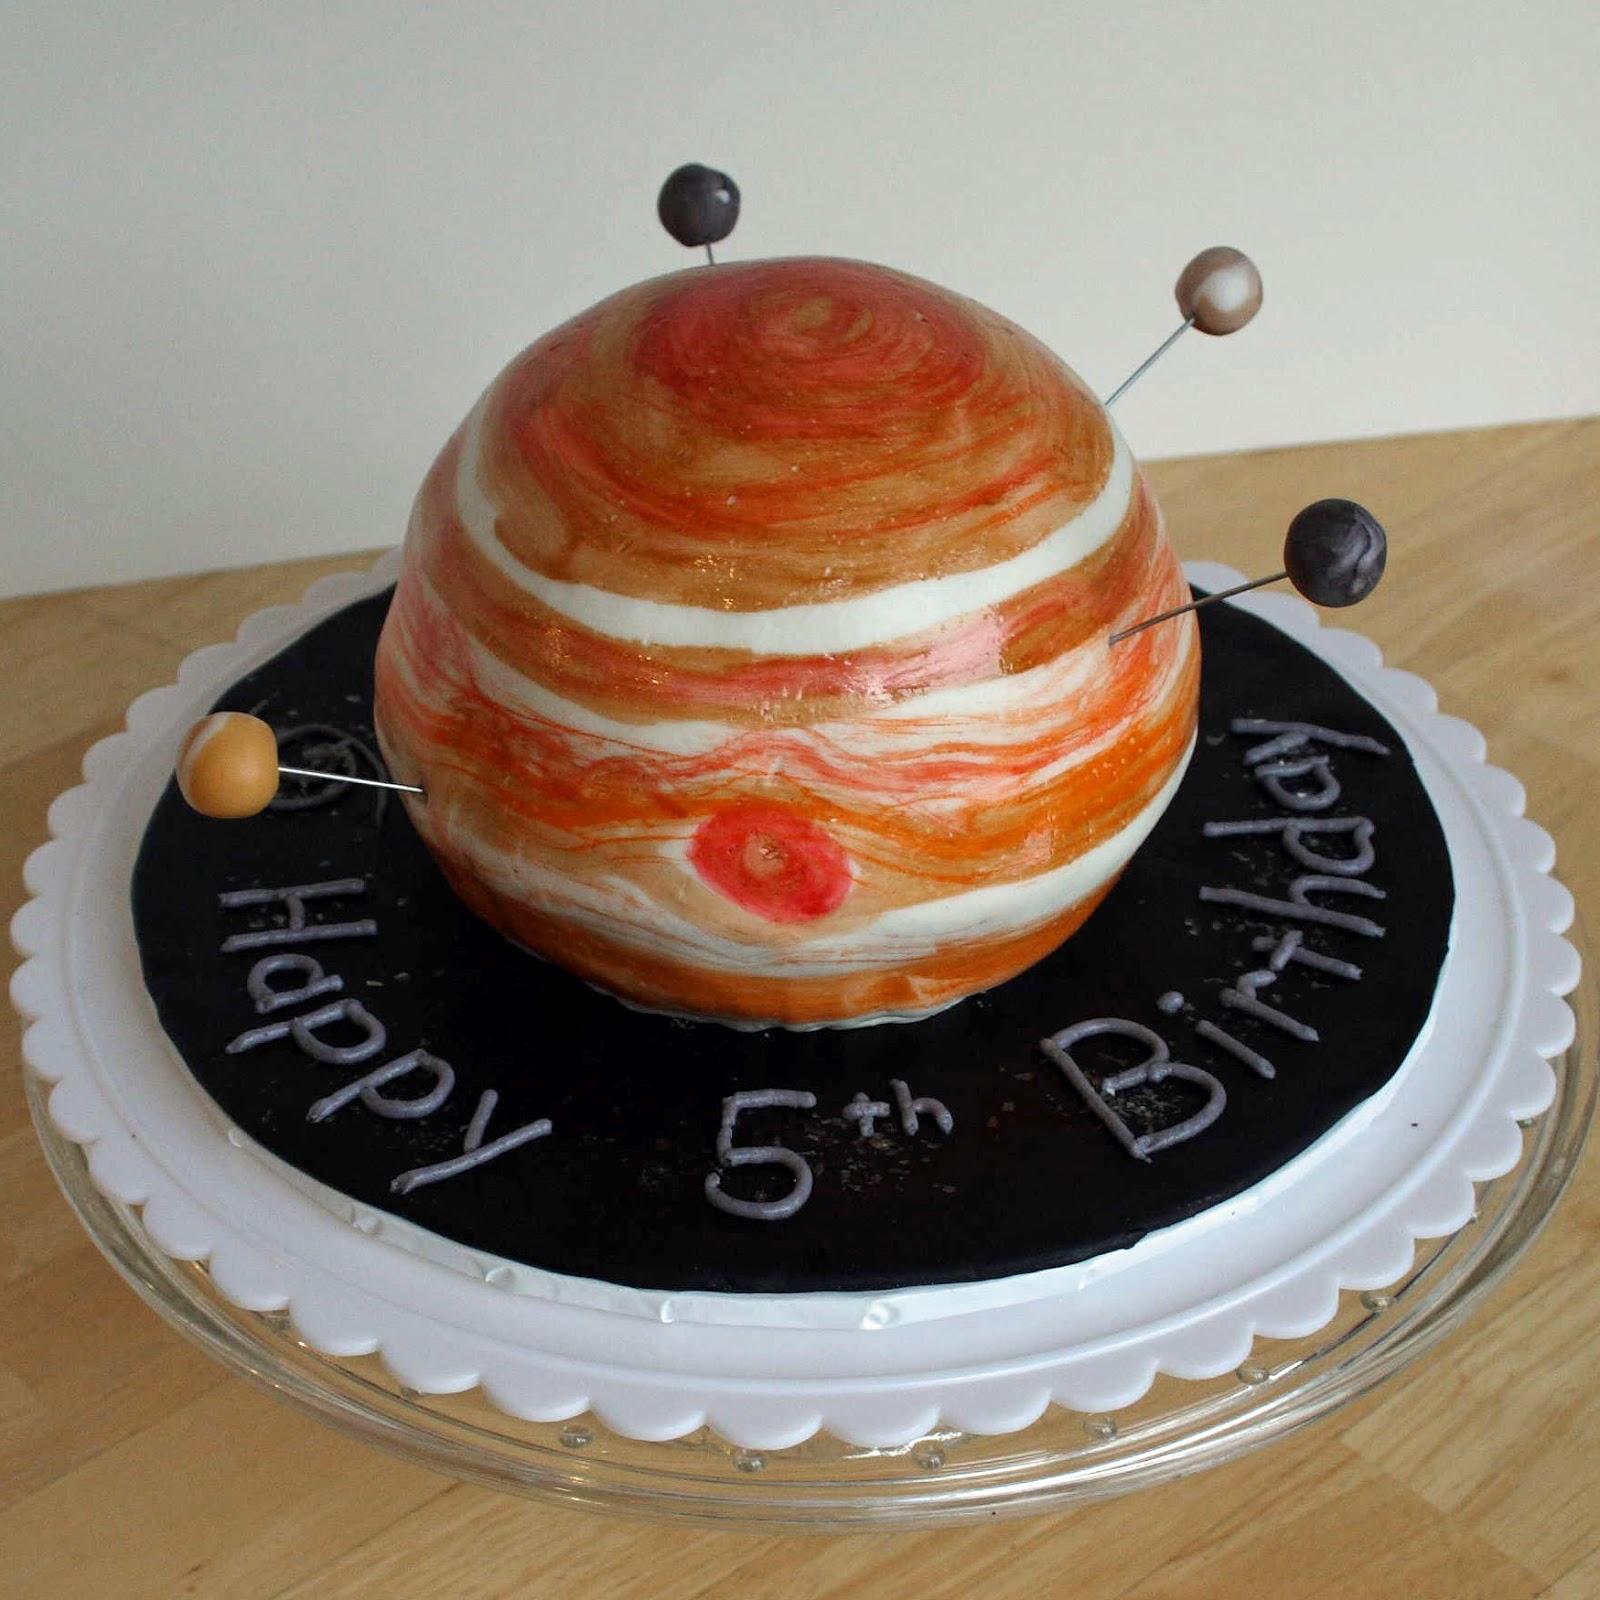 planet jupiter cake - photo #24